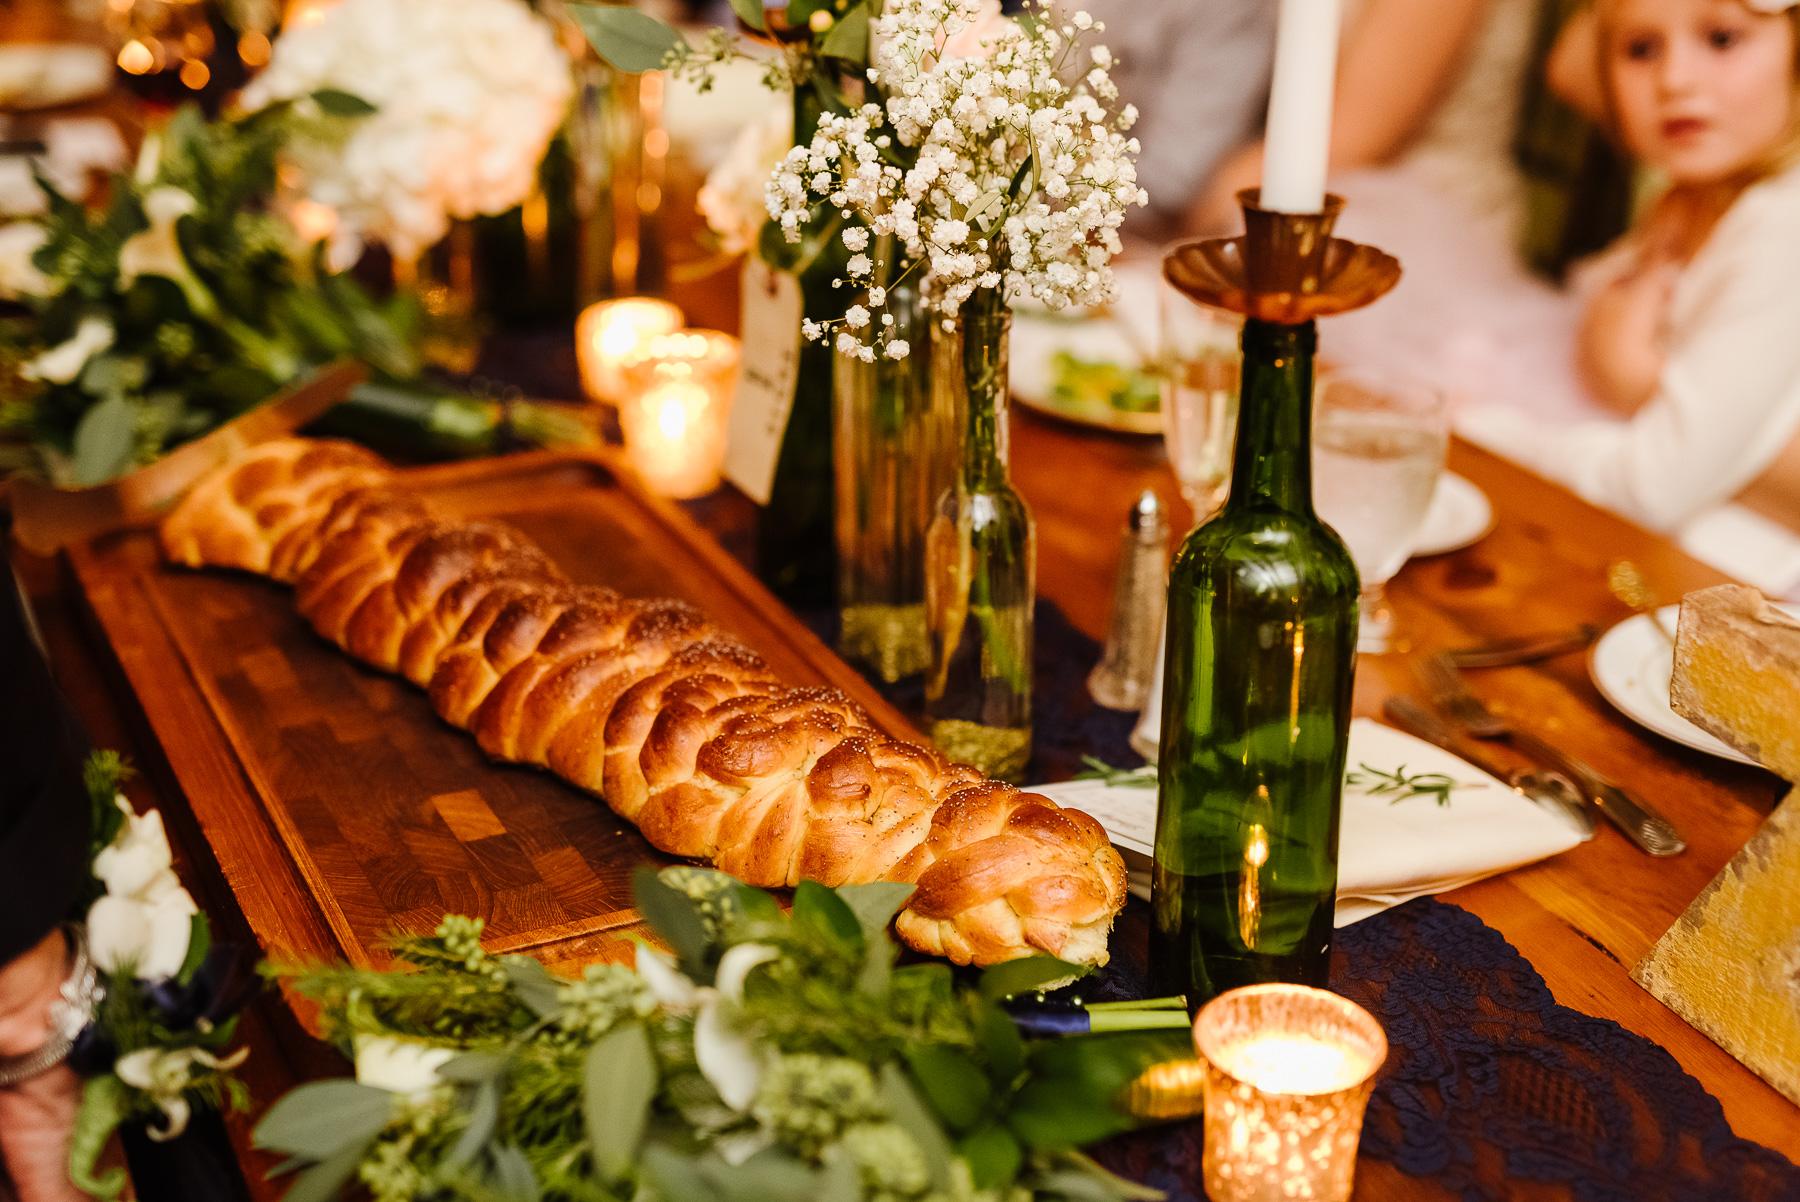 109-Laurita Winery Wedding New Jersey Wedding Photographer Laurita Winery Weddings Longbrook Photography.jpg